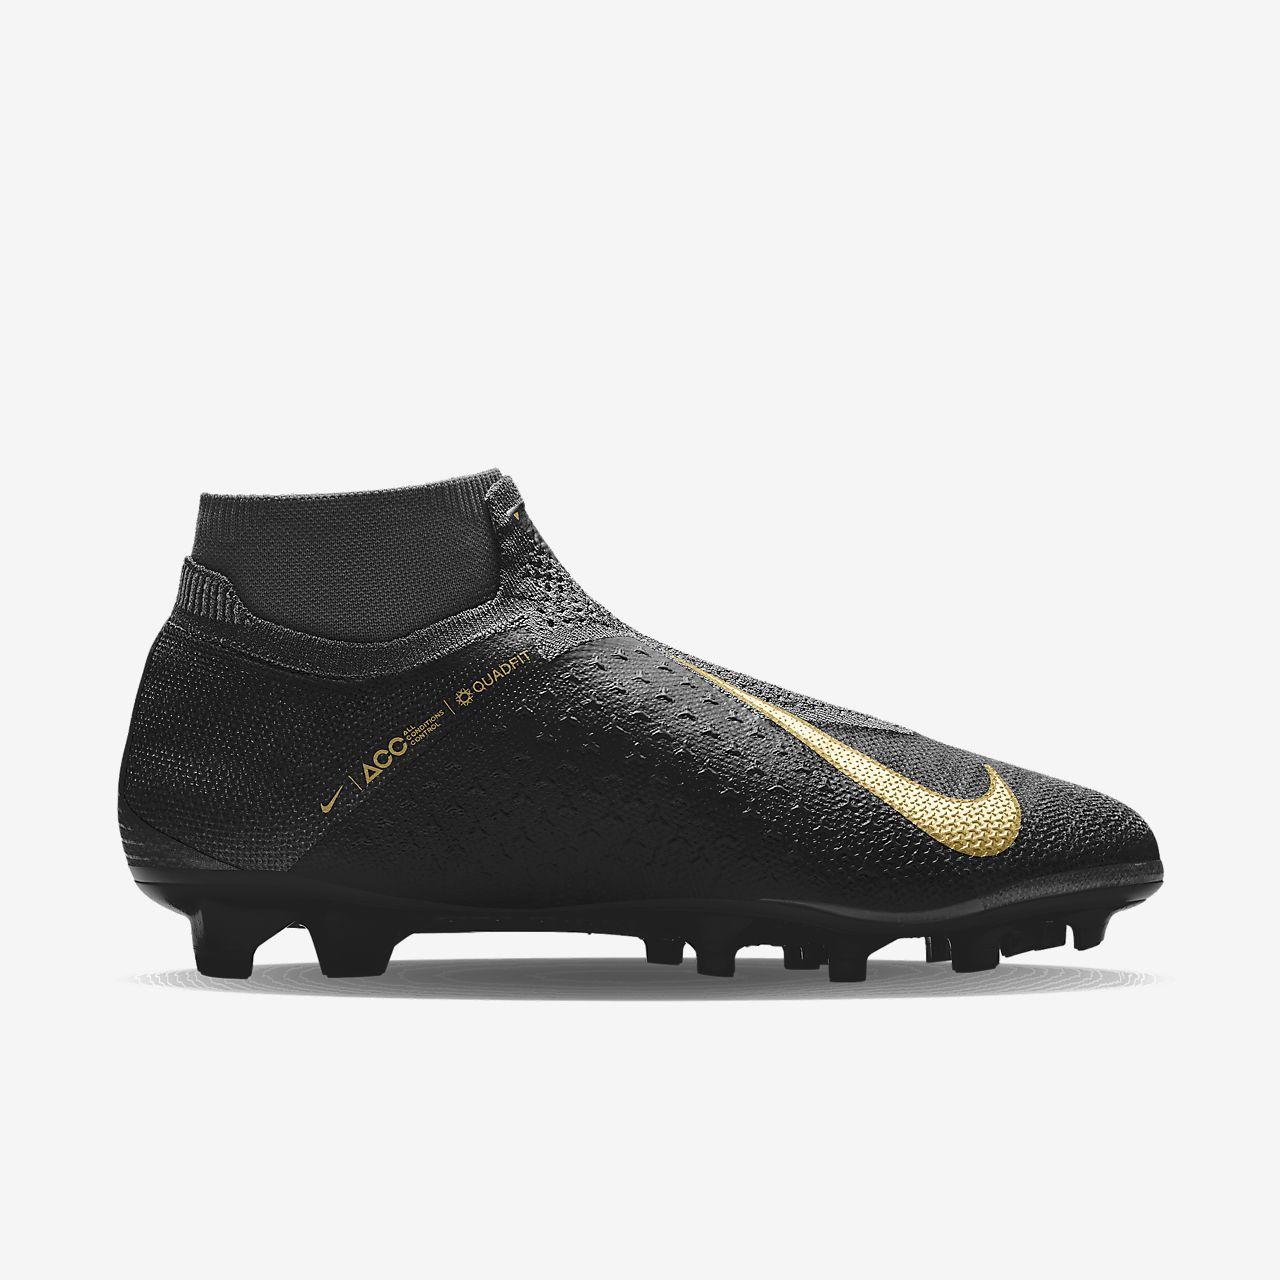 Nike Phantom Vision Elite Fg By You Personalisierbarer Fussballschuh Fur Normalen Rasen